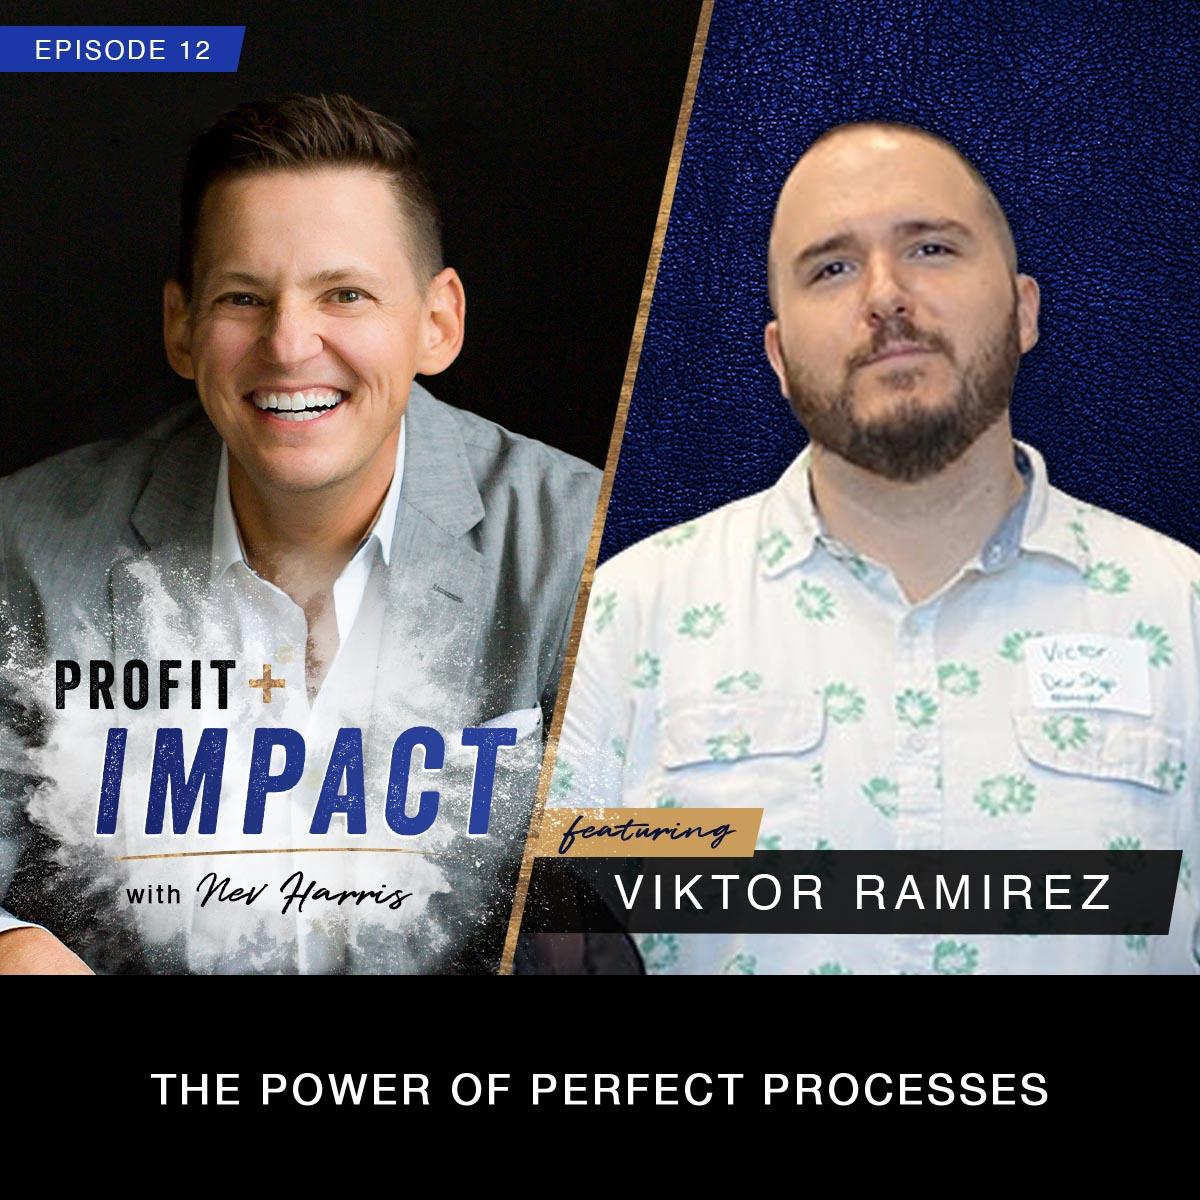 Podcast with Viktor Ramirez EP 12